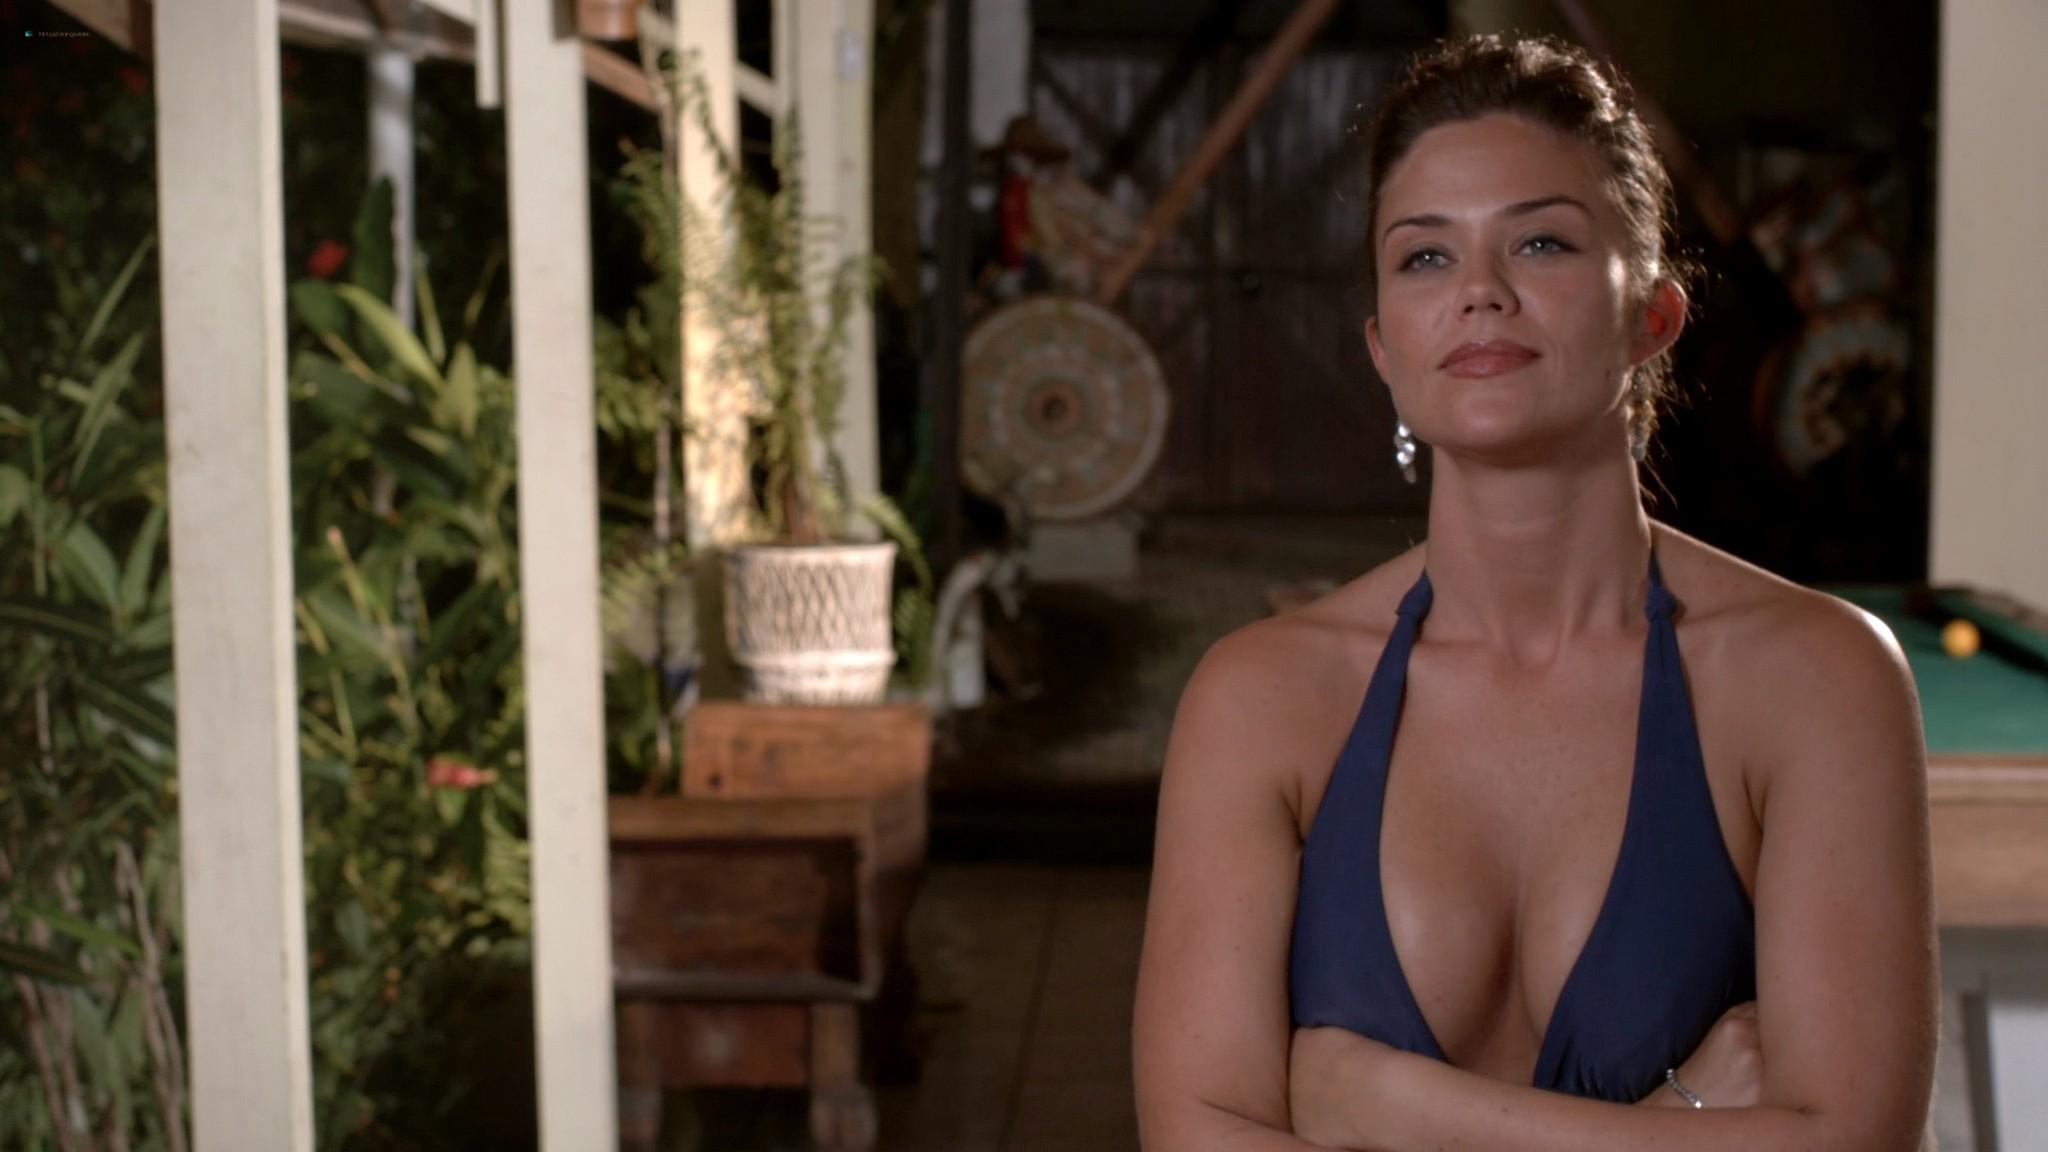 Dana Kollar and Sheila Platte nude topless Julianna Guill and Susan Ward hot Costa Rican Summer 2009 1080p Web 14